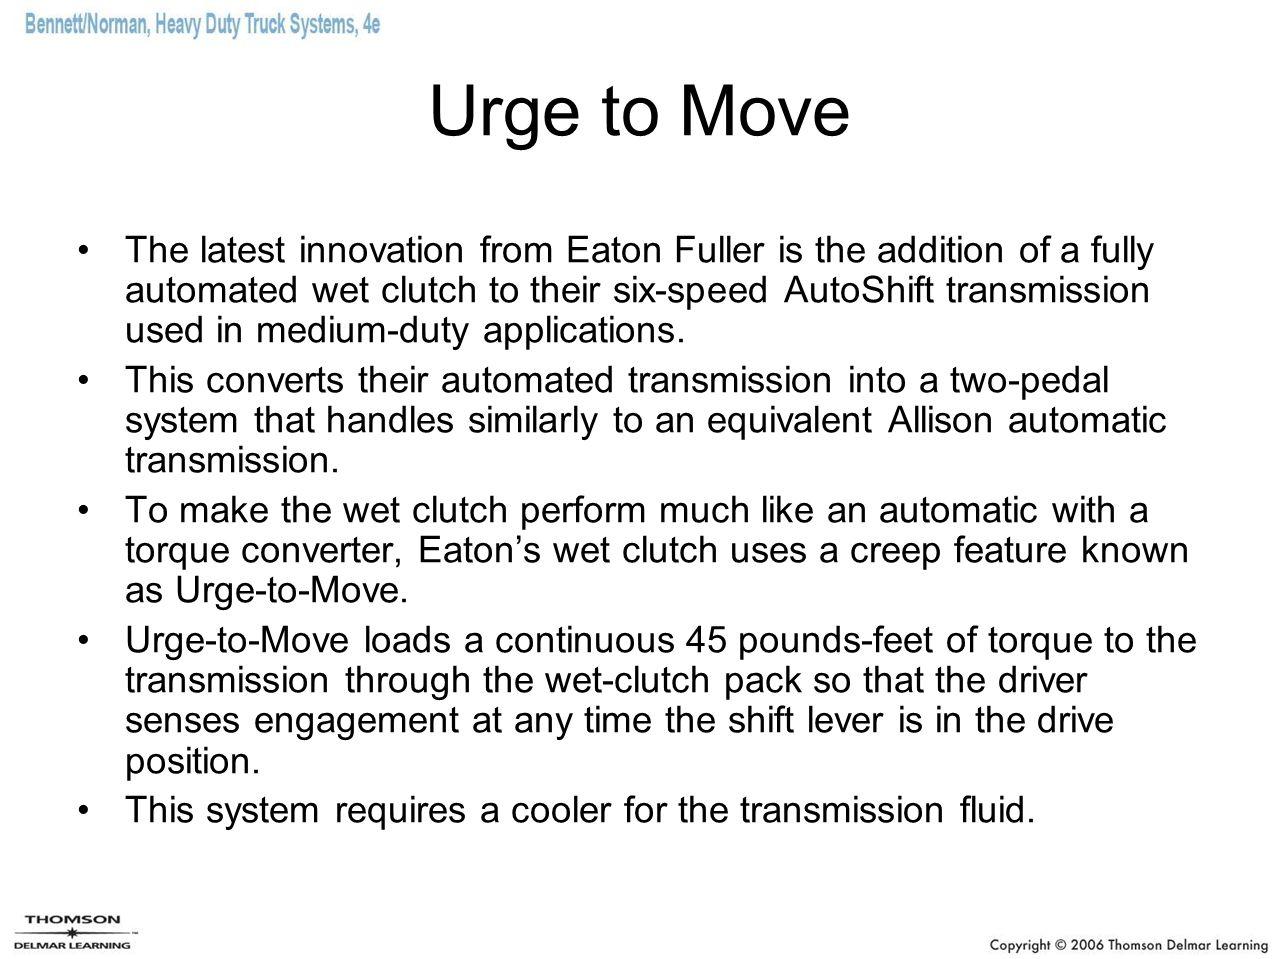 Urge to Move